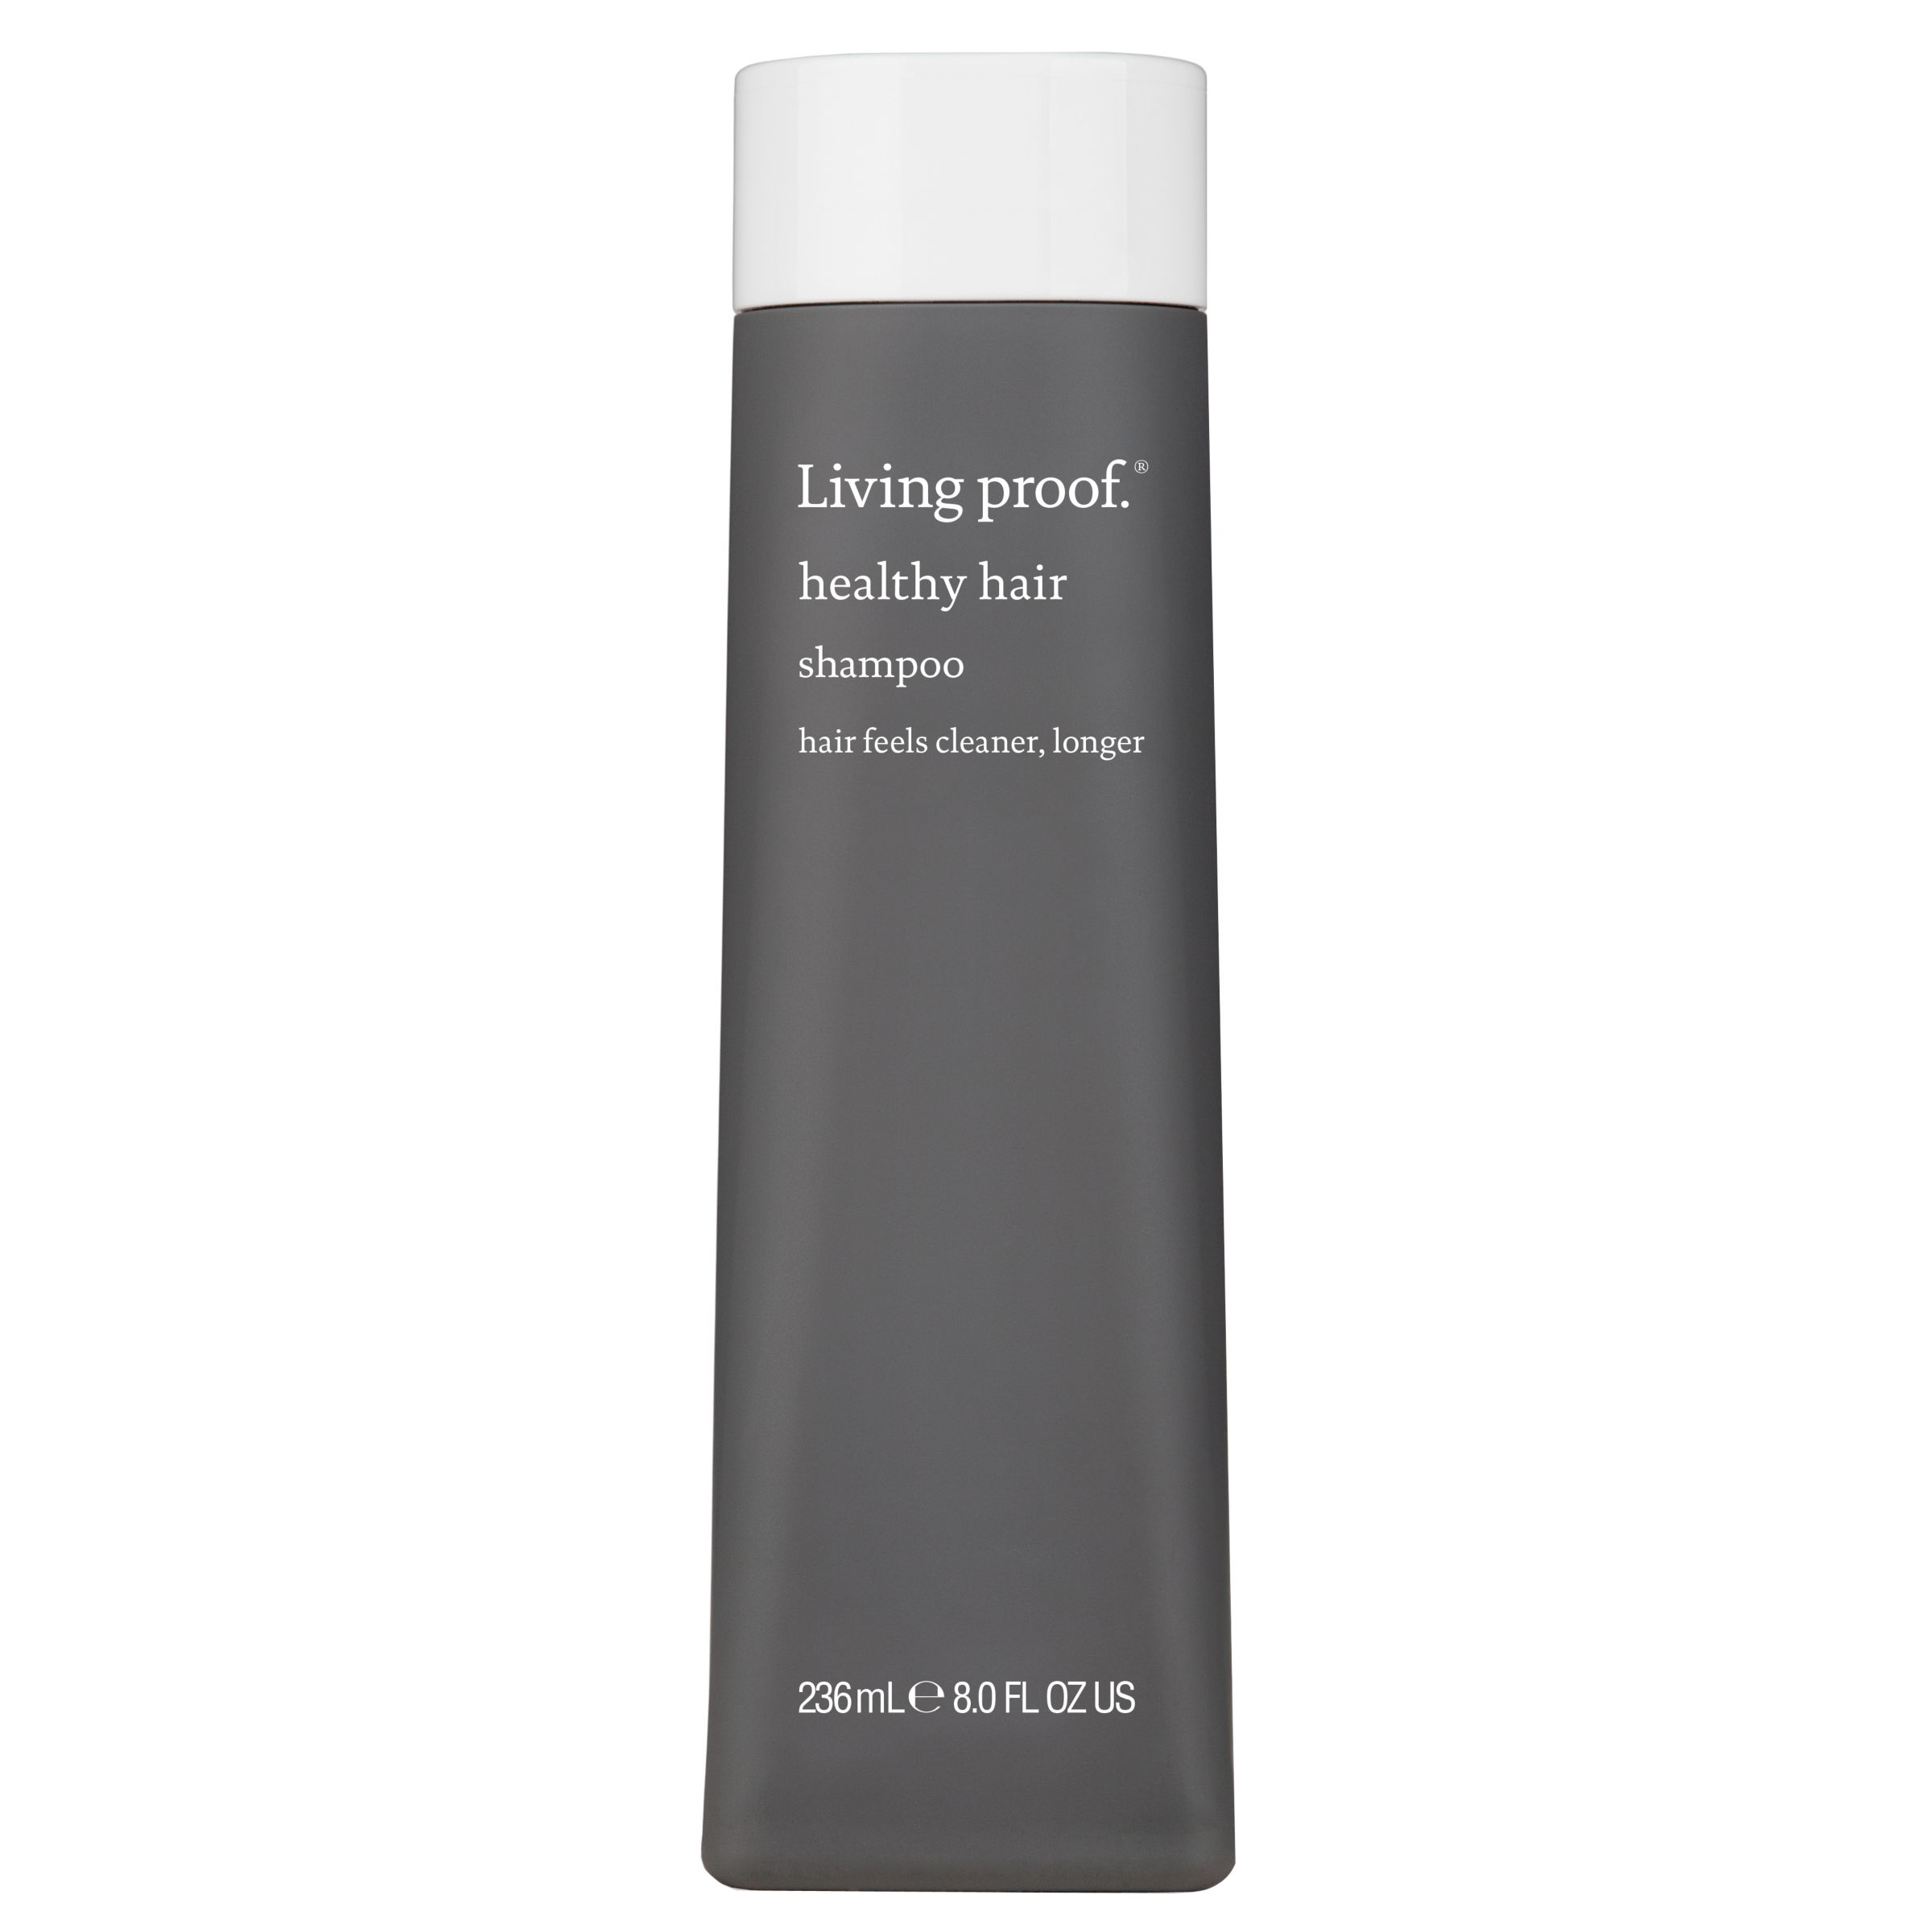 Living Proof Living Proof Healthy Hair Shampoo, 236ml